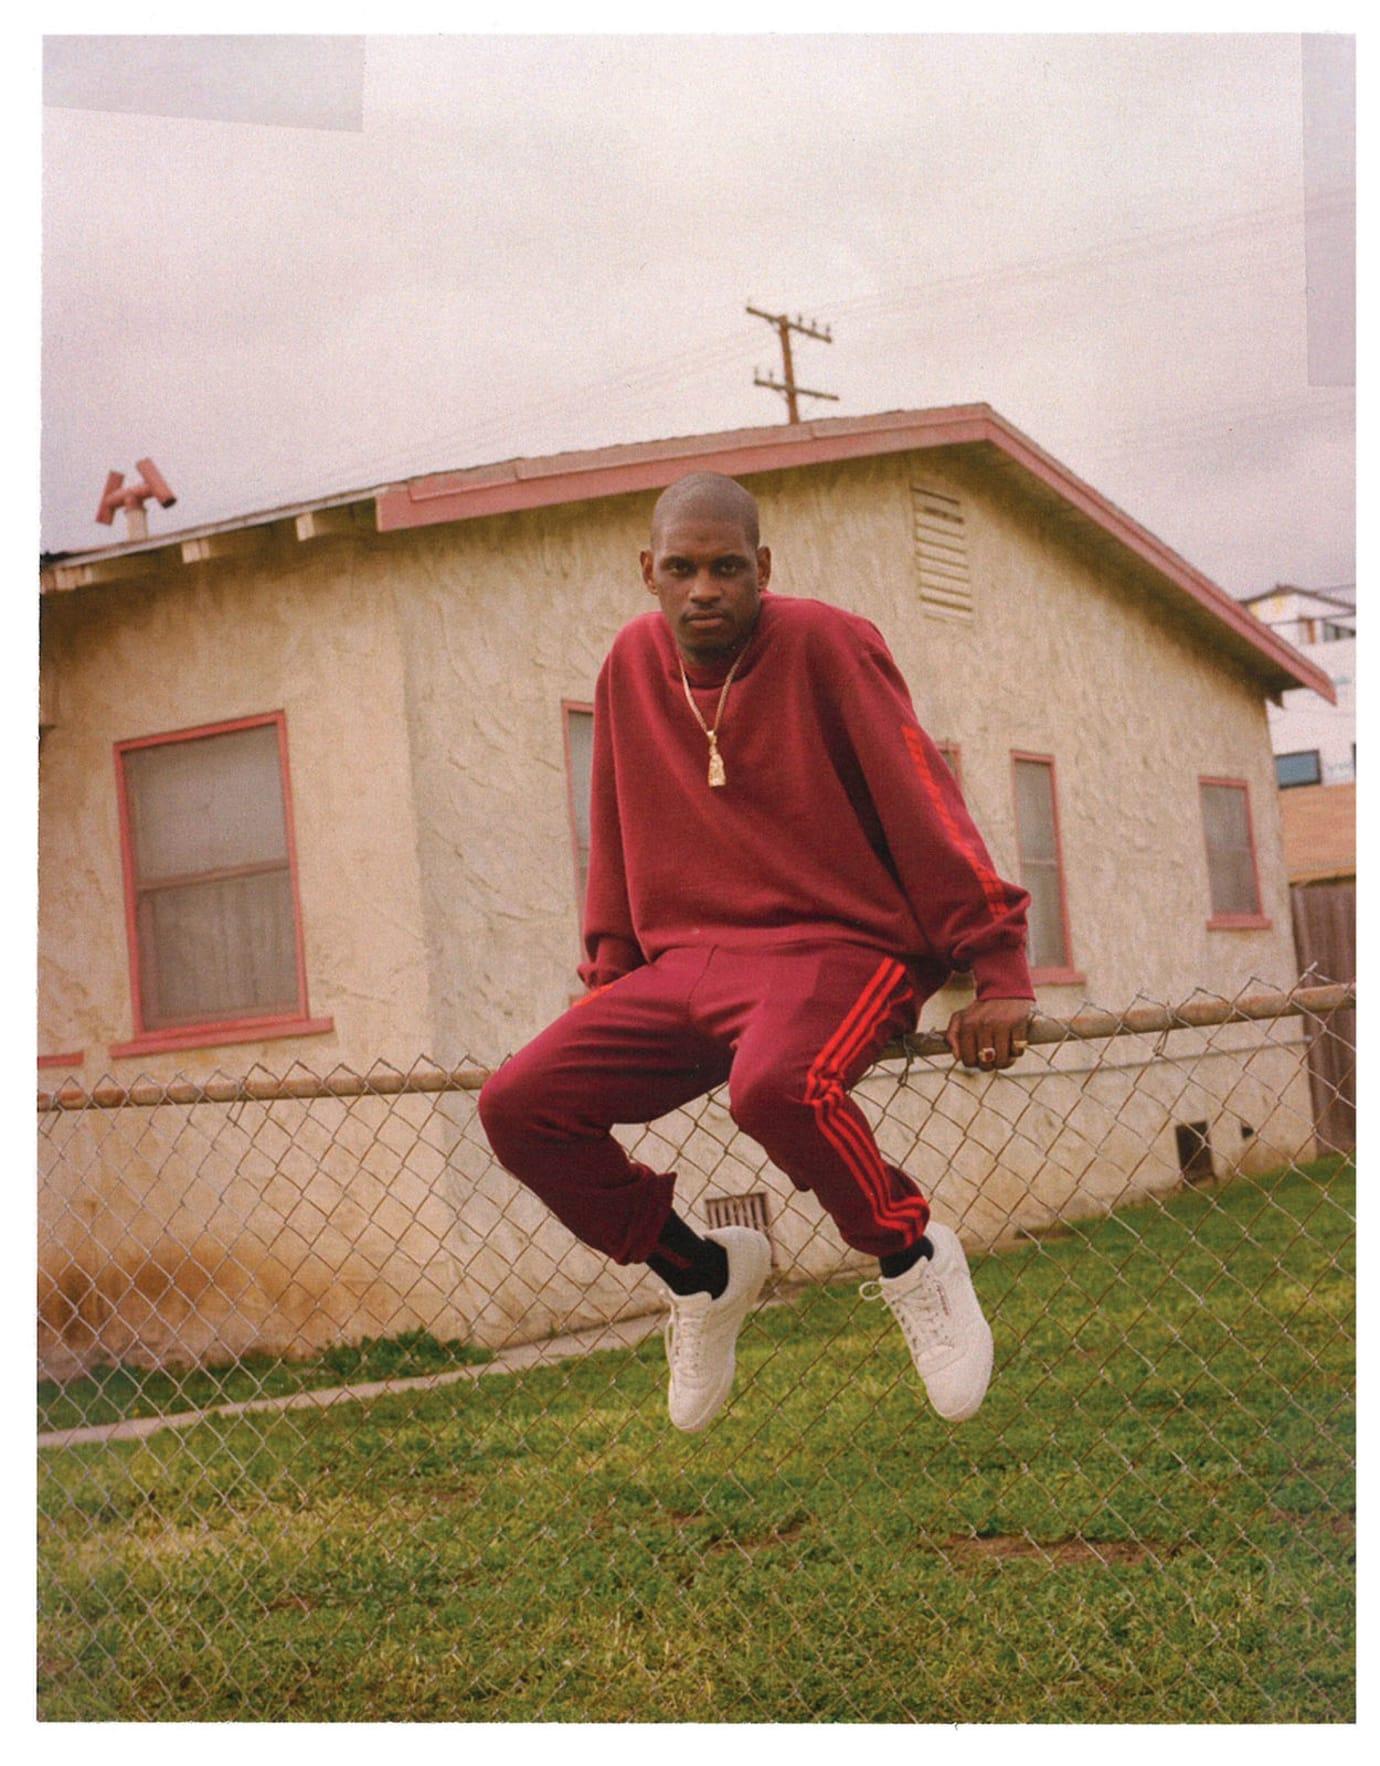 adidas Calabasas Powerphase to nowy projekt Kanye Westa?